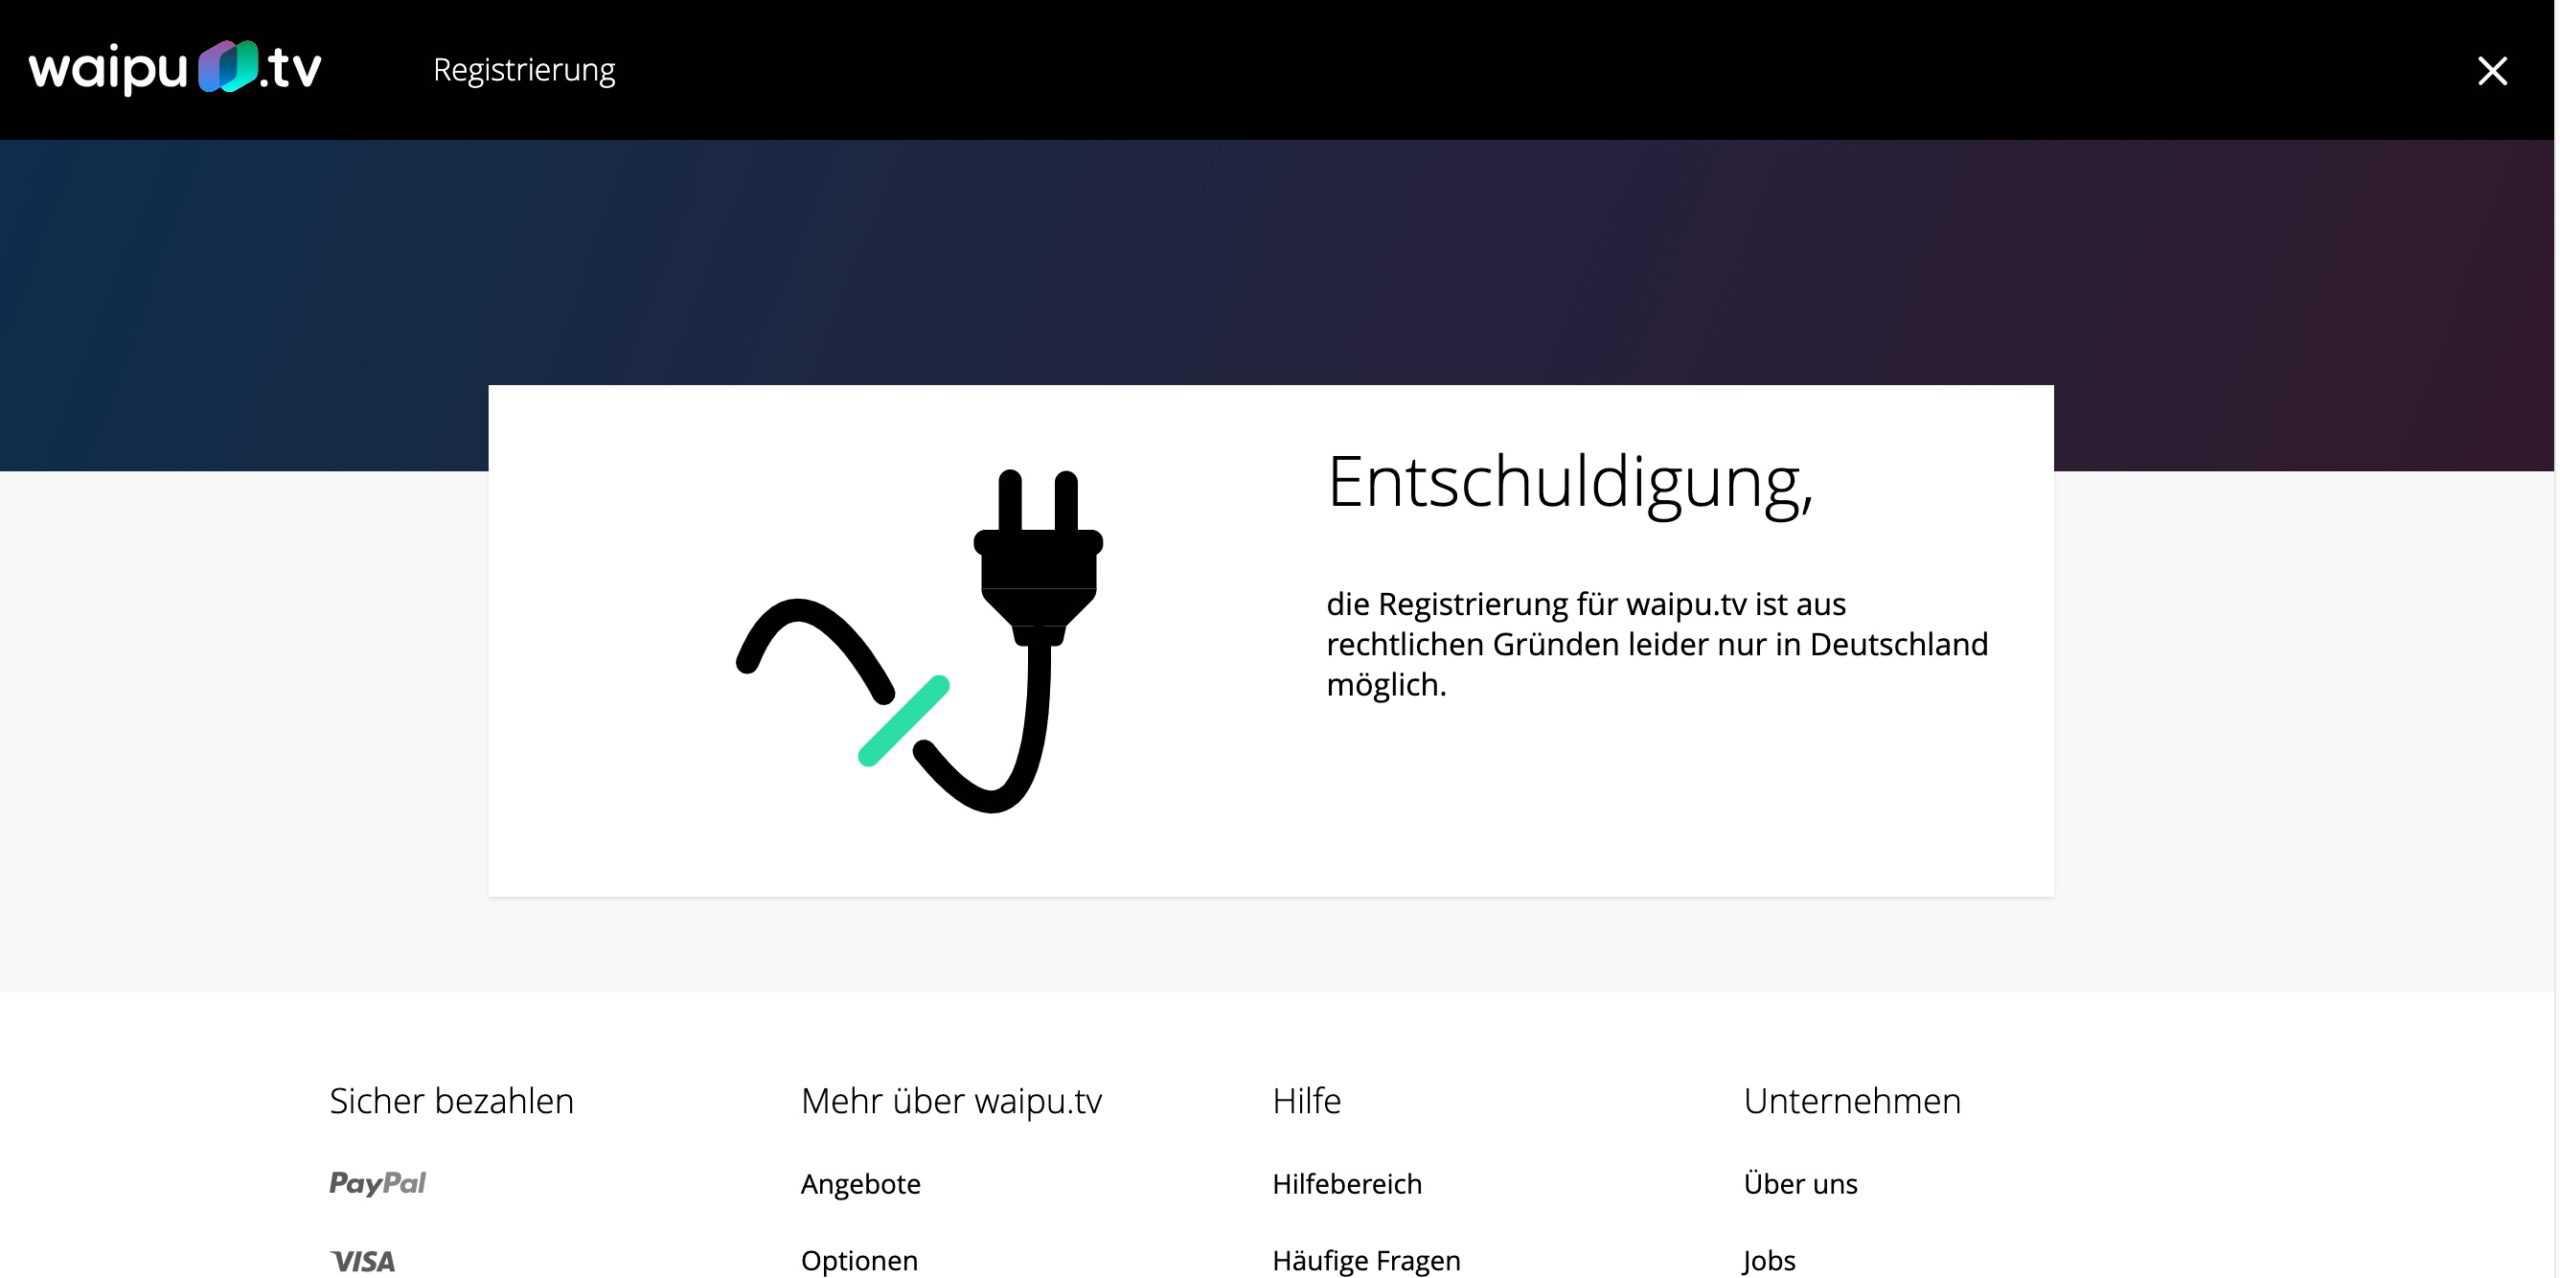 Waipu.tv Fehlermeldung